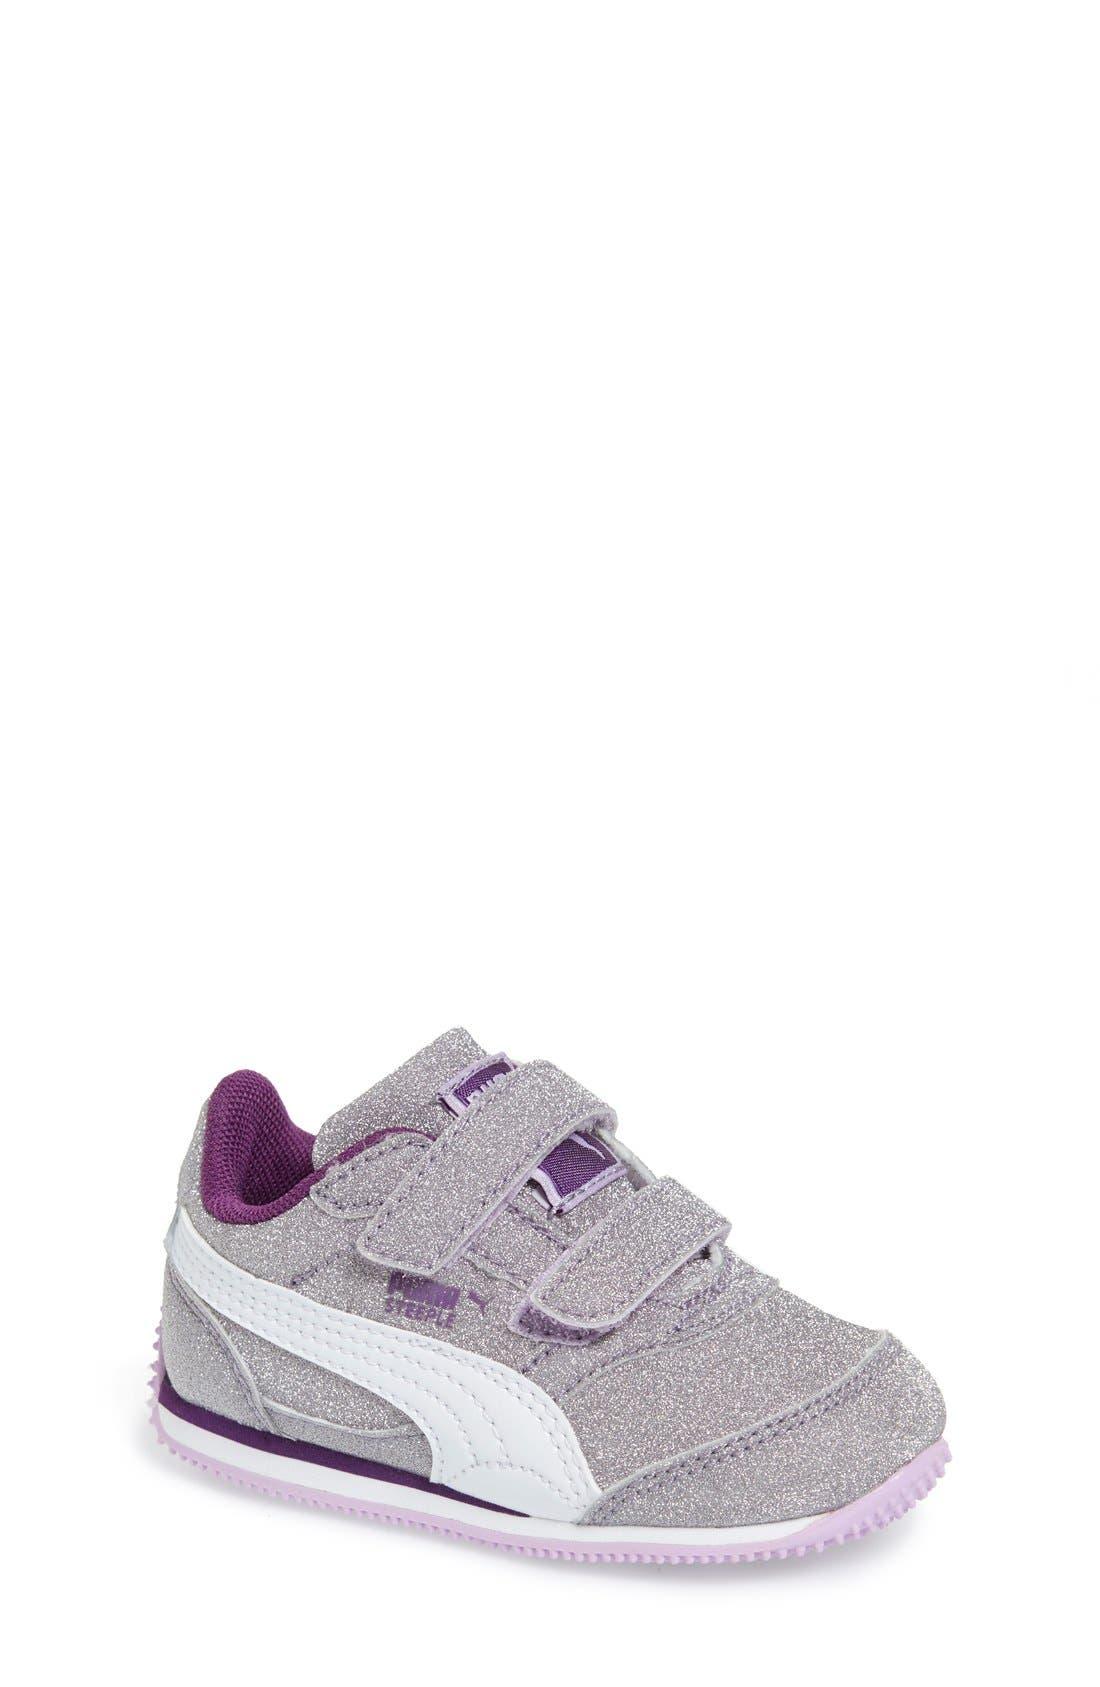 Alternate Image 1 Selected - PUMA 'Steeple Glitz' Sneaker (Baby, Walker, Toddler, Little Kid & Big Kid)